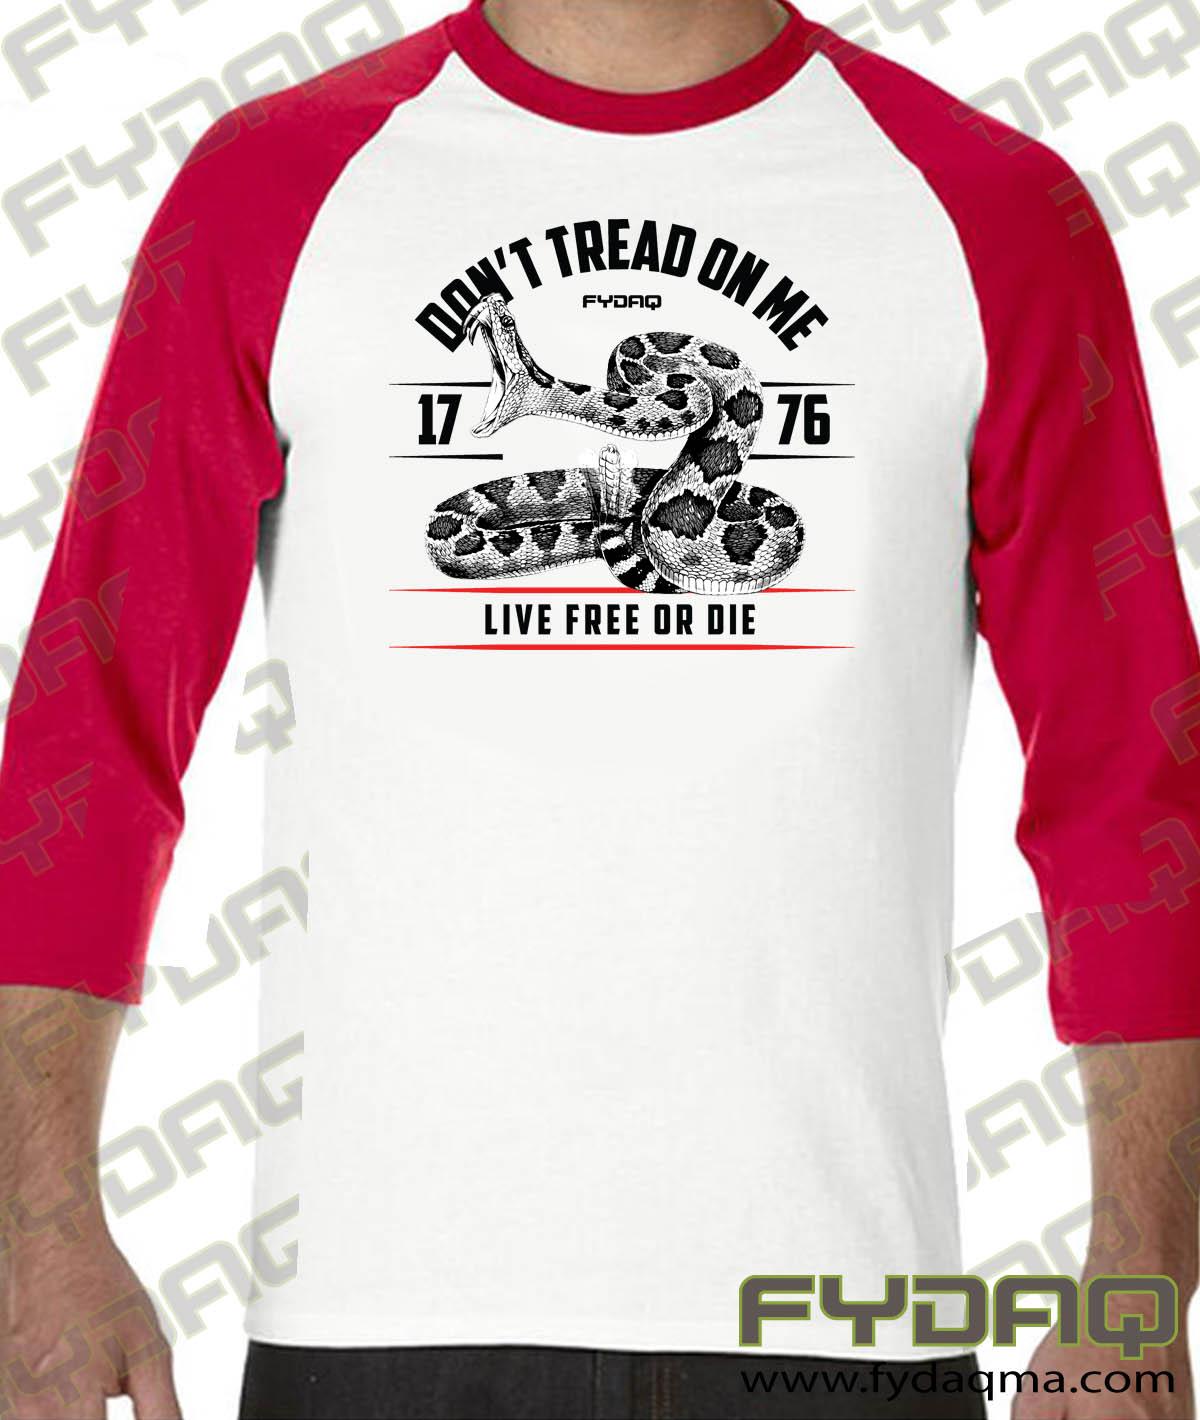 dont-tread-on-me-raglan-white-red-fydaq